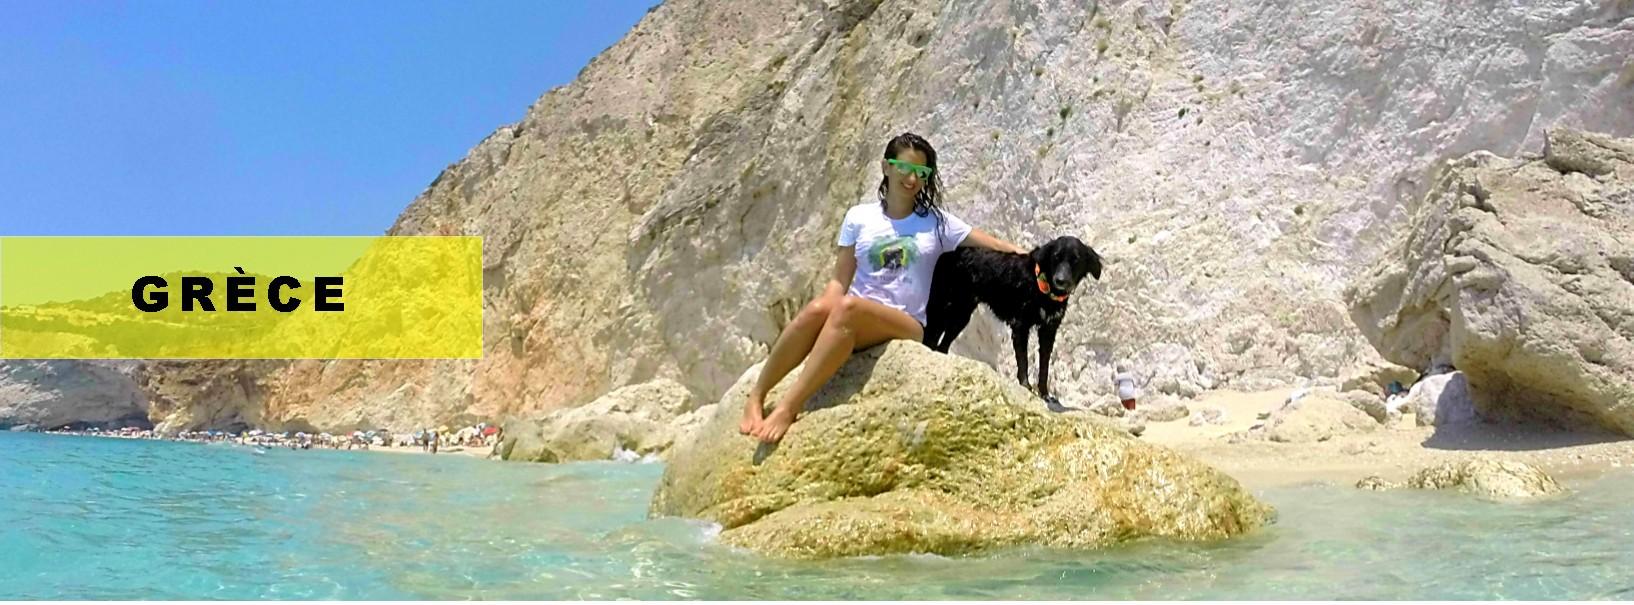 voyager avec un chien en grece